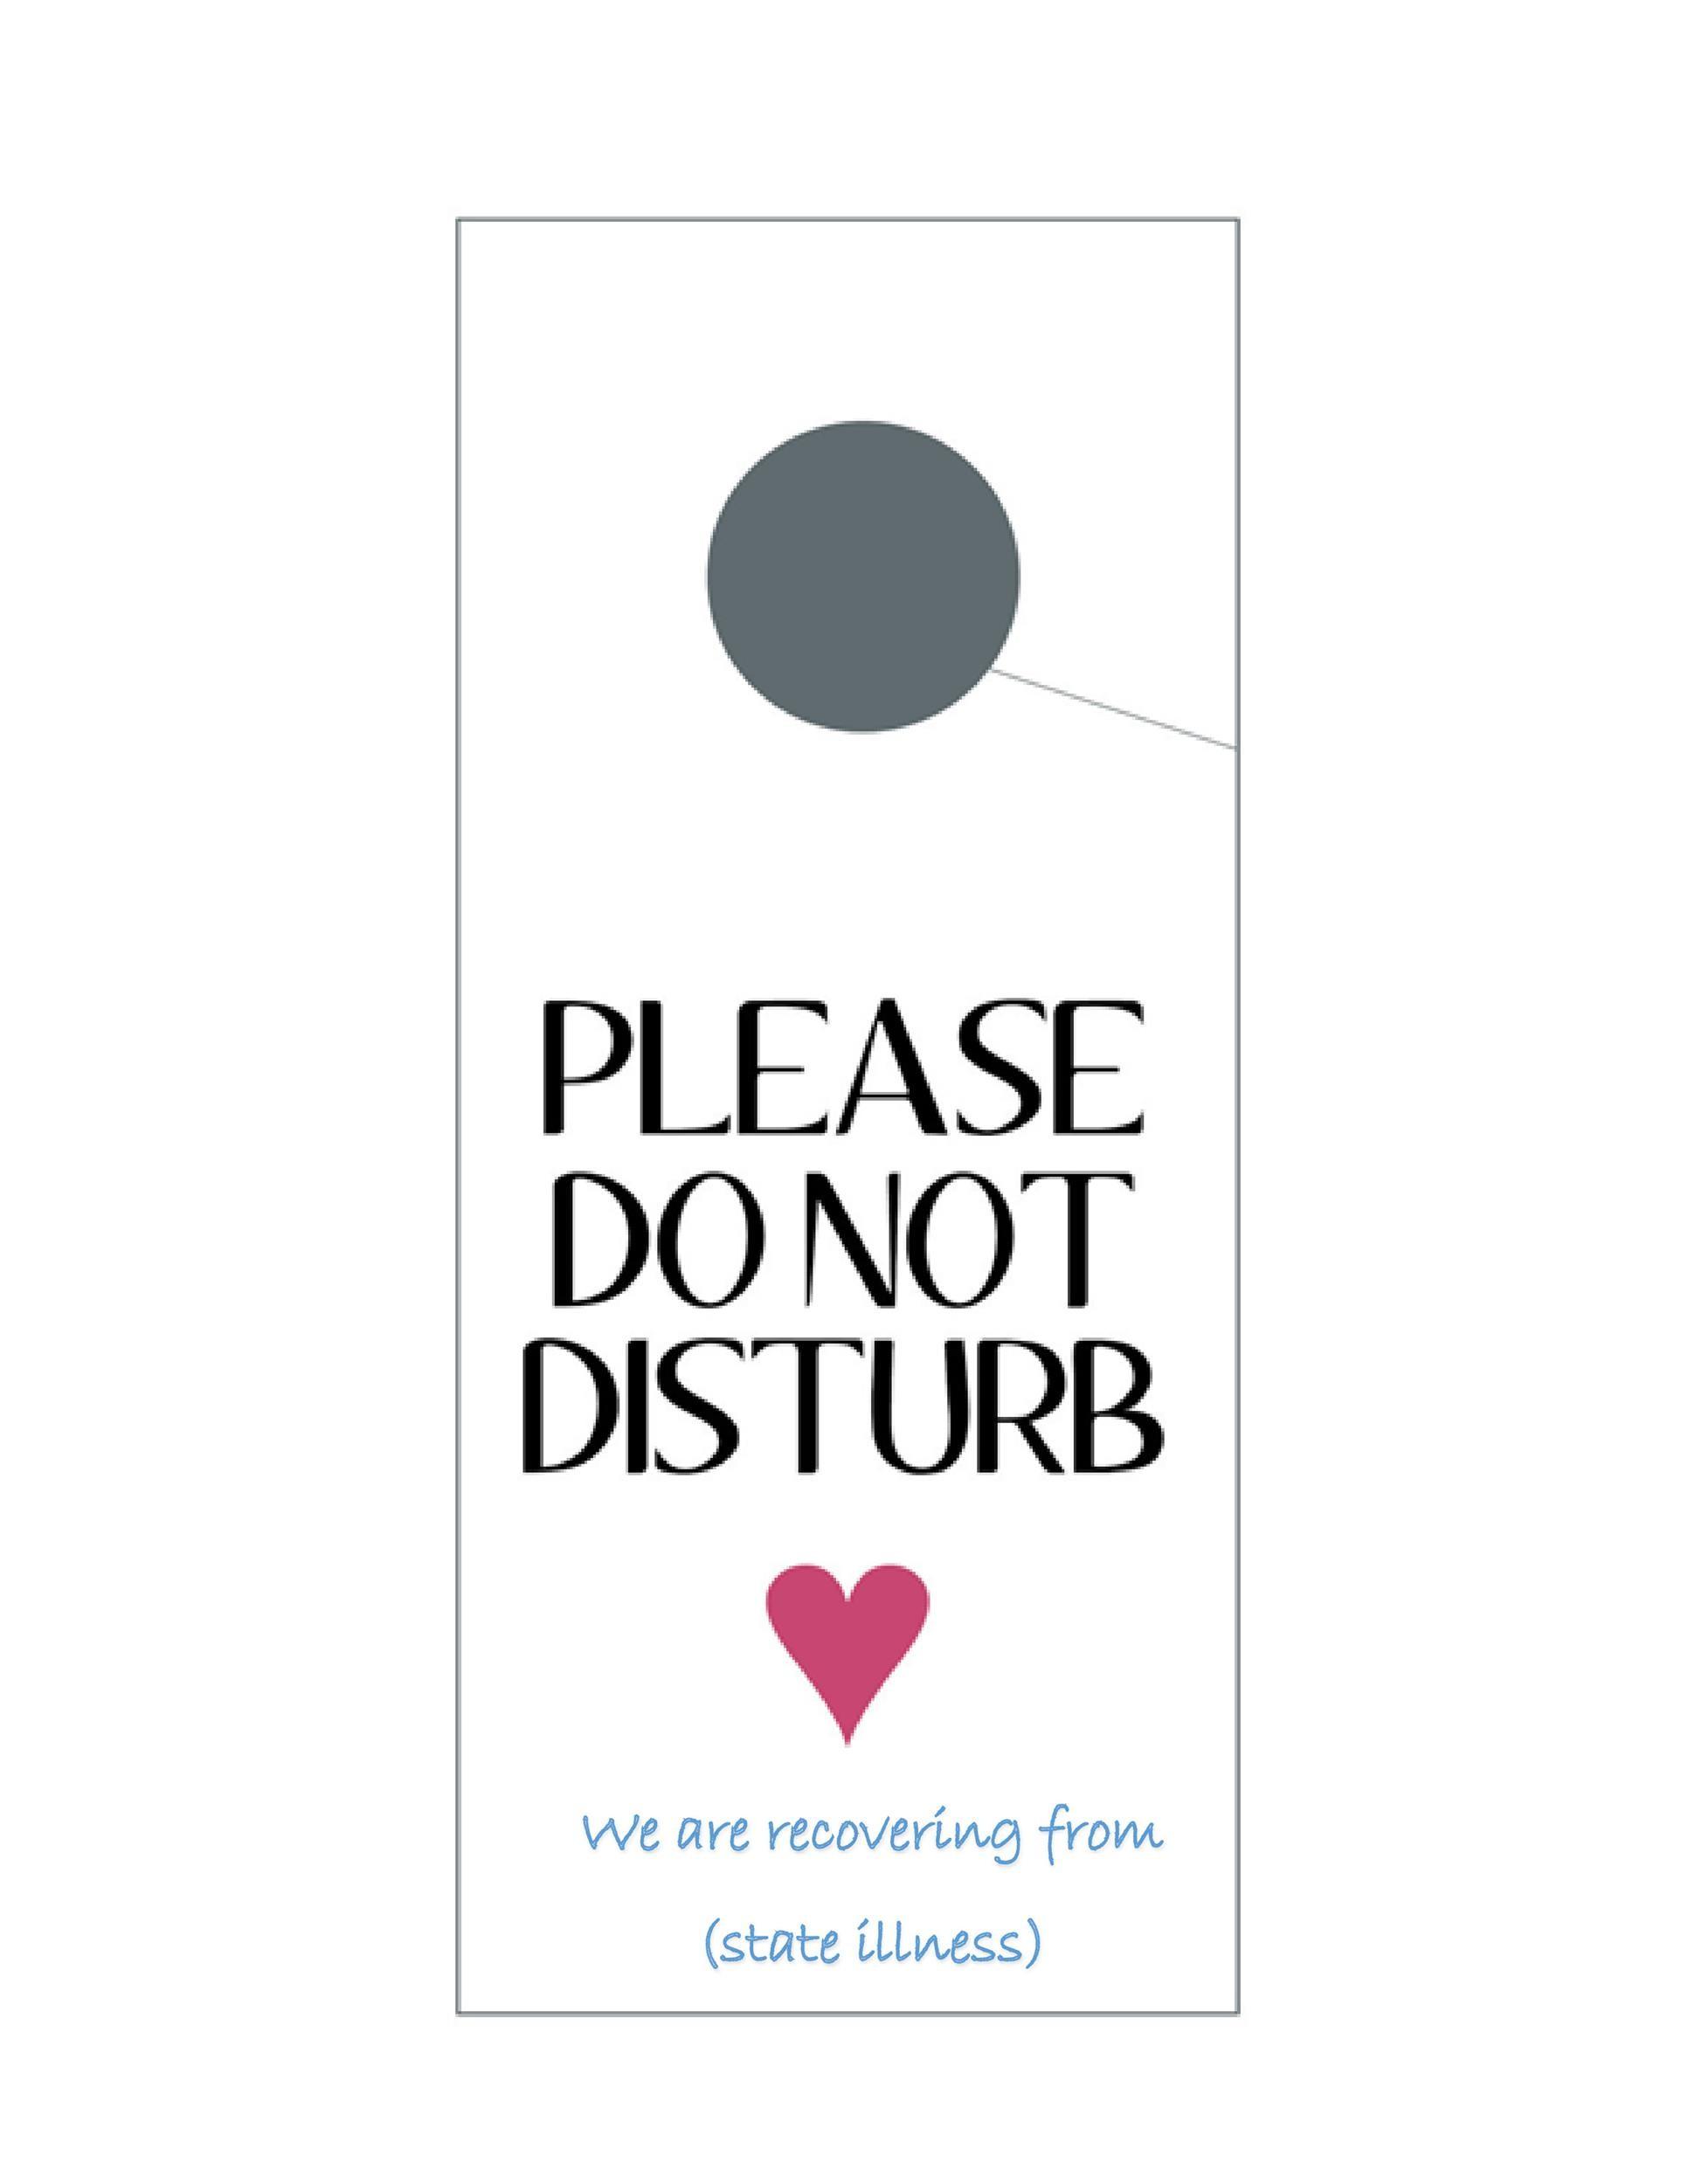 43 Free Door Hanger Templates (Word, PDF) ᐅ Template Lab